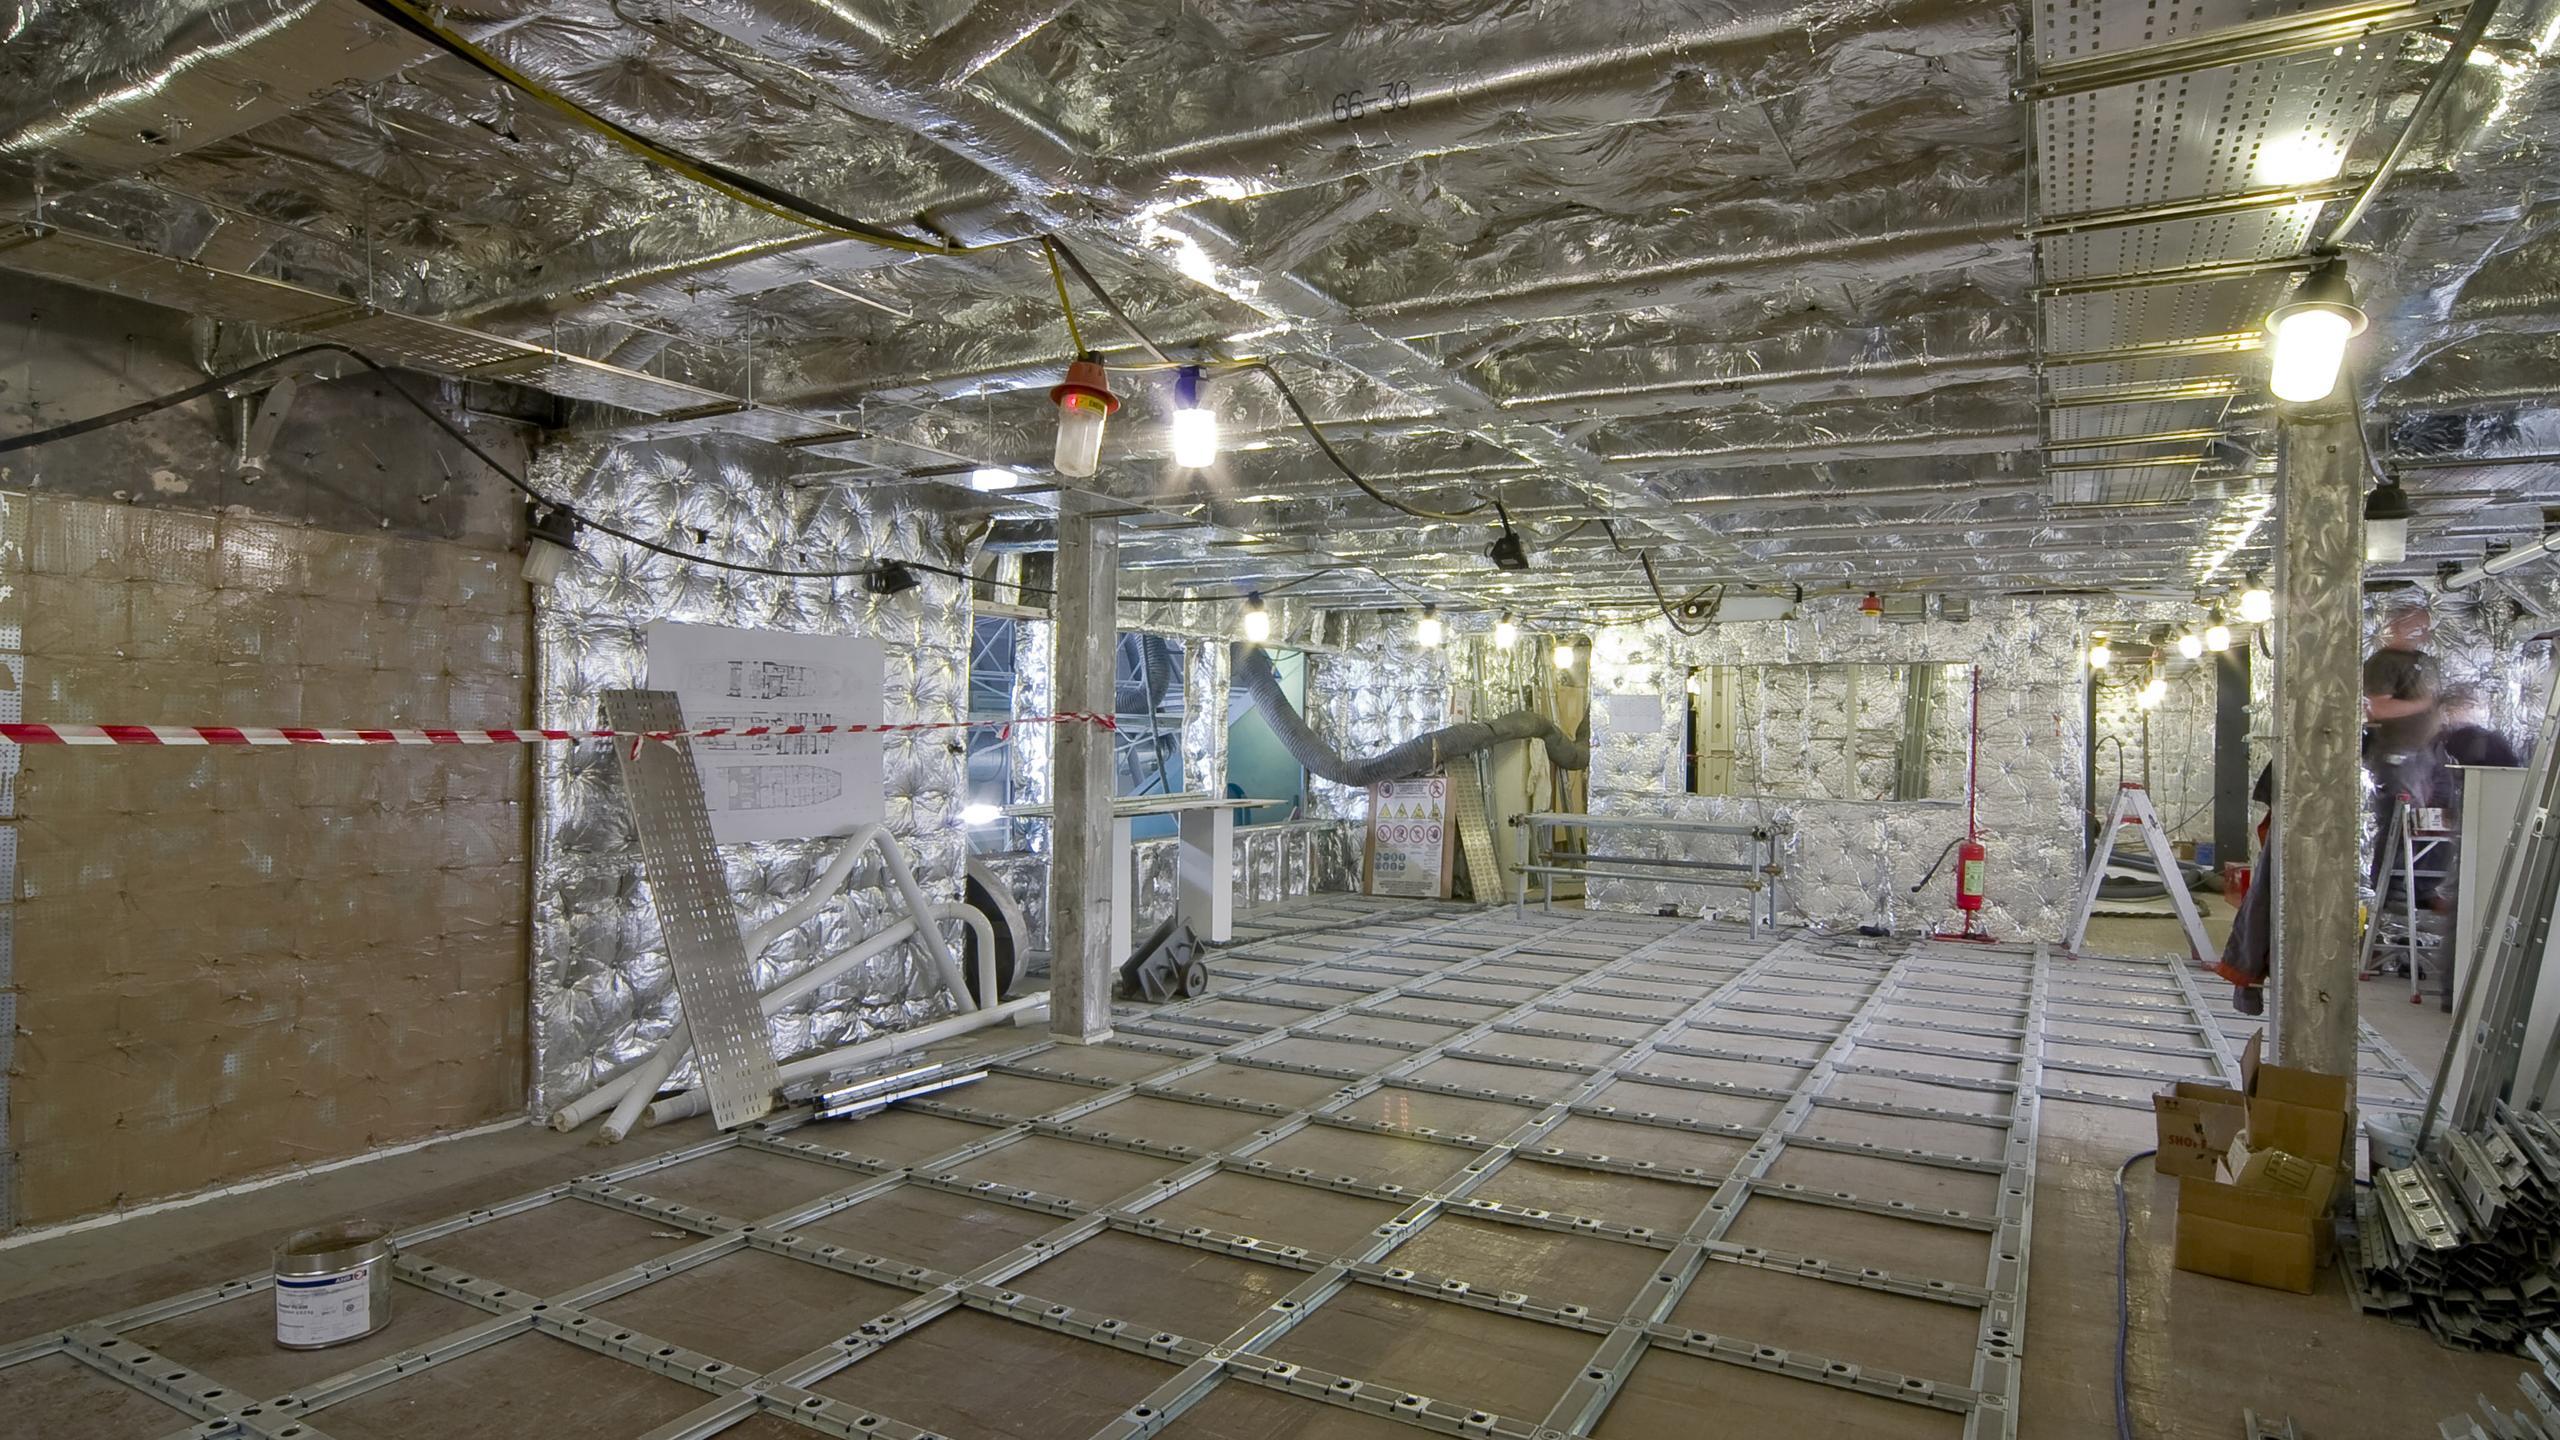 solo s701 motoryacht tankoa yachts 72m 2018 under construction main deck